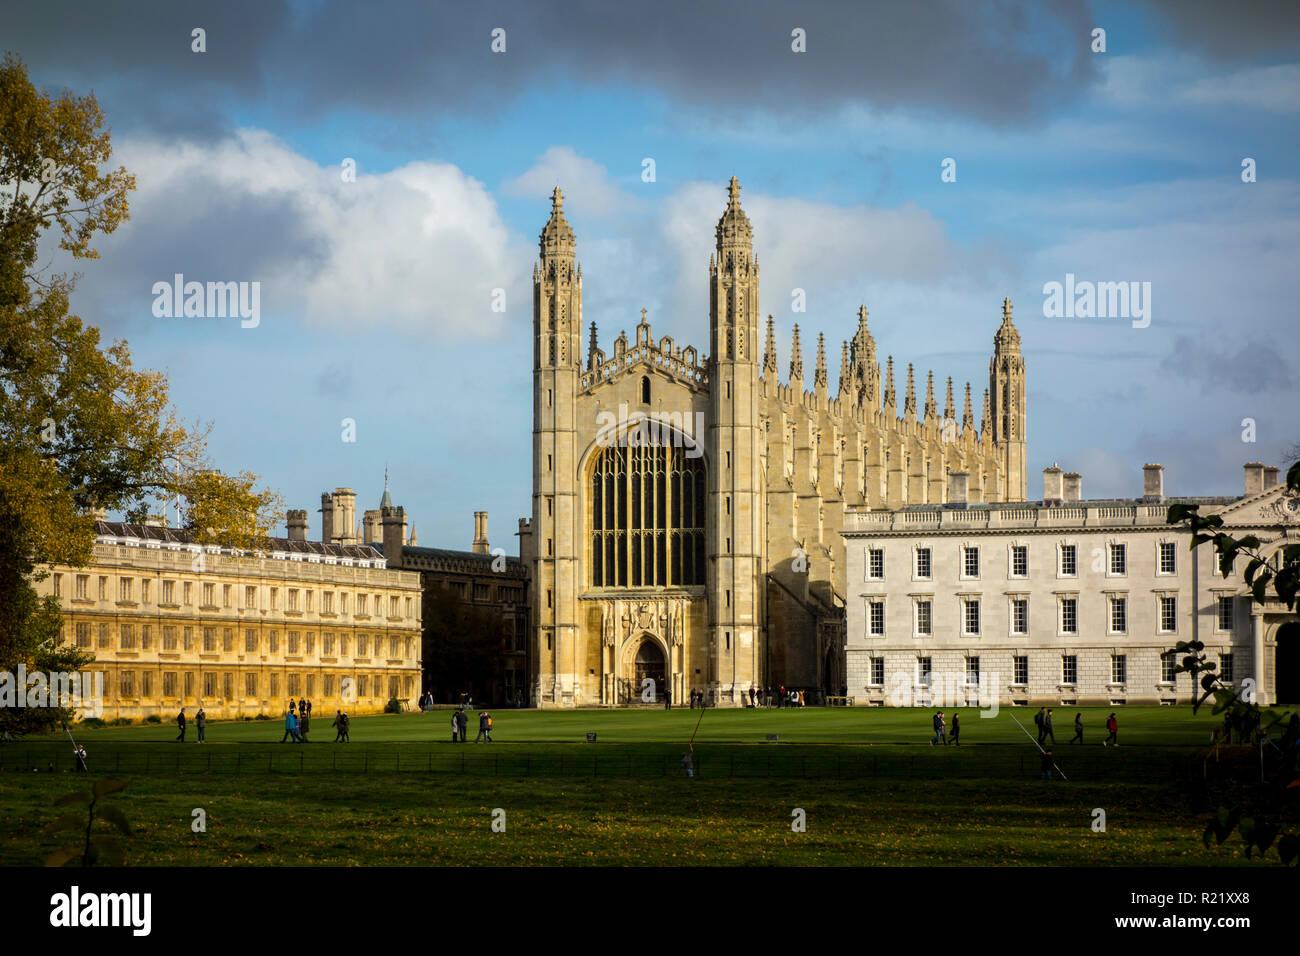 King's College Chapel, Cambridge University in the Autumn. University of Cambridge, UK Stock Photo